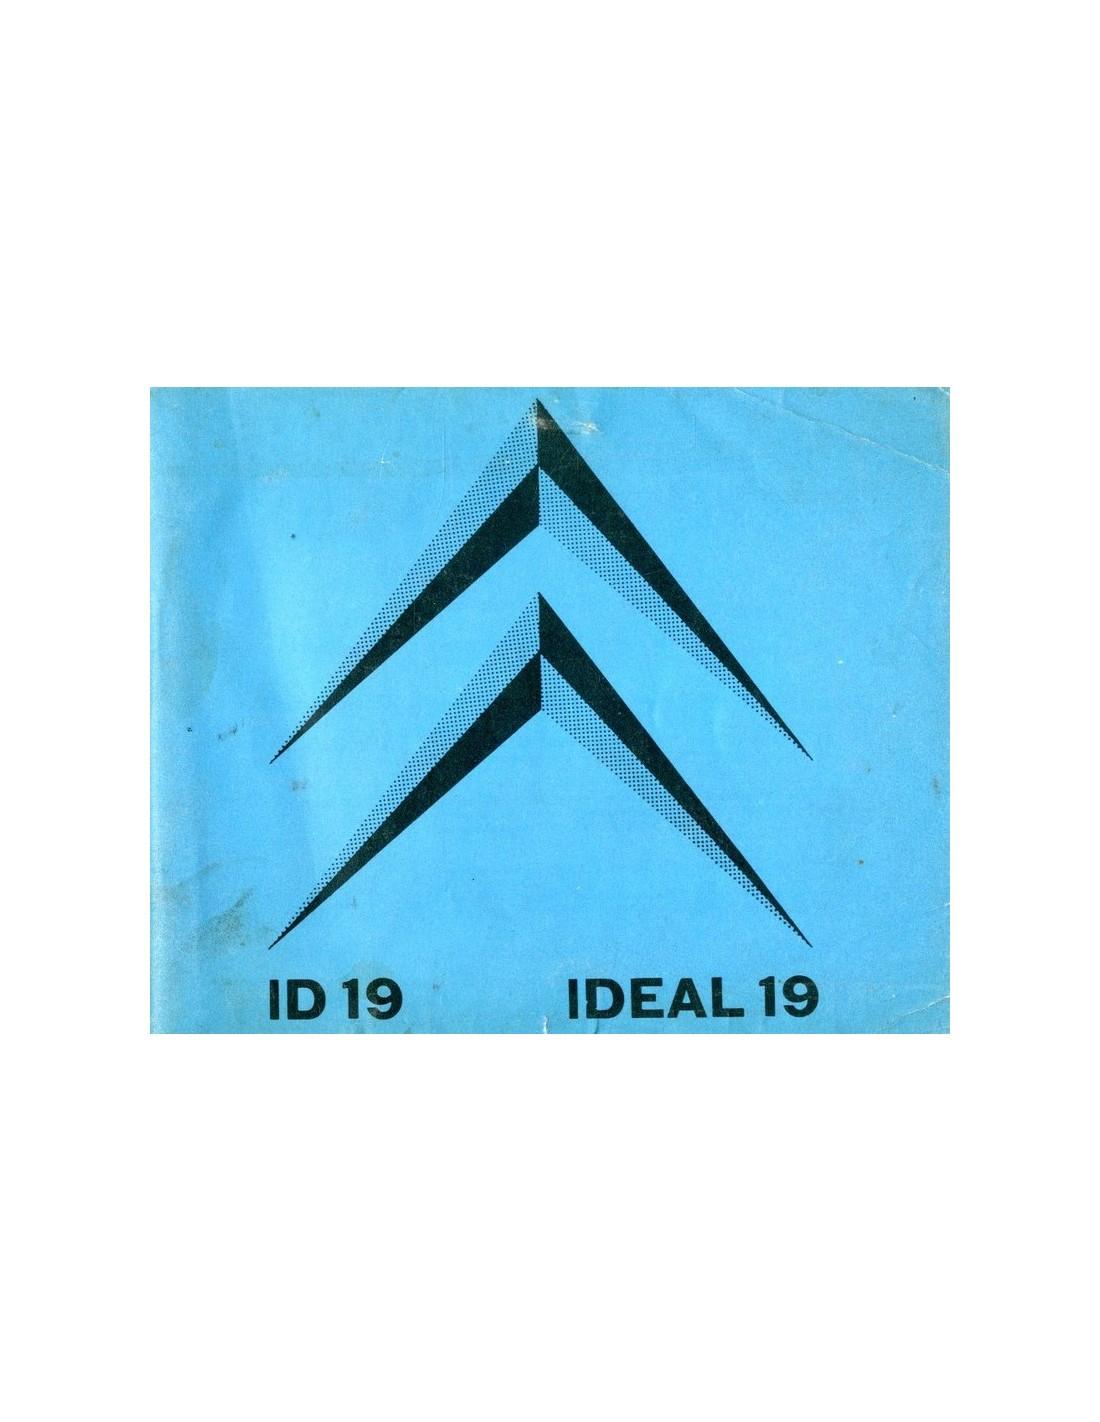 1962 citroen id 19 owner s manual dutch rh autolit eu citroen c4 owners manual Citroen C3